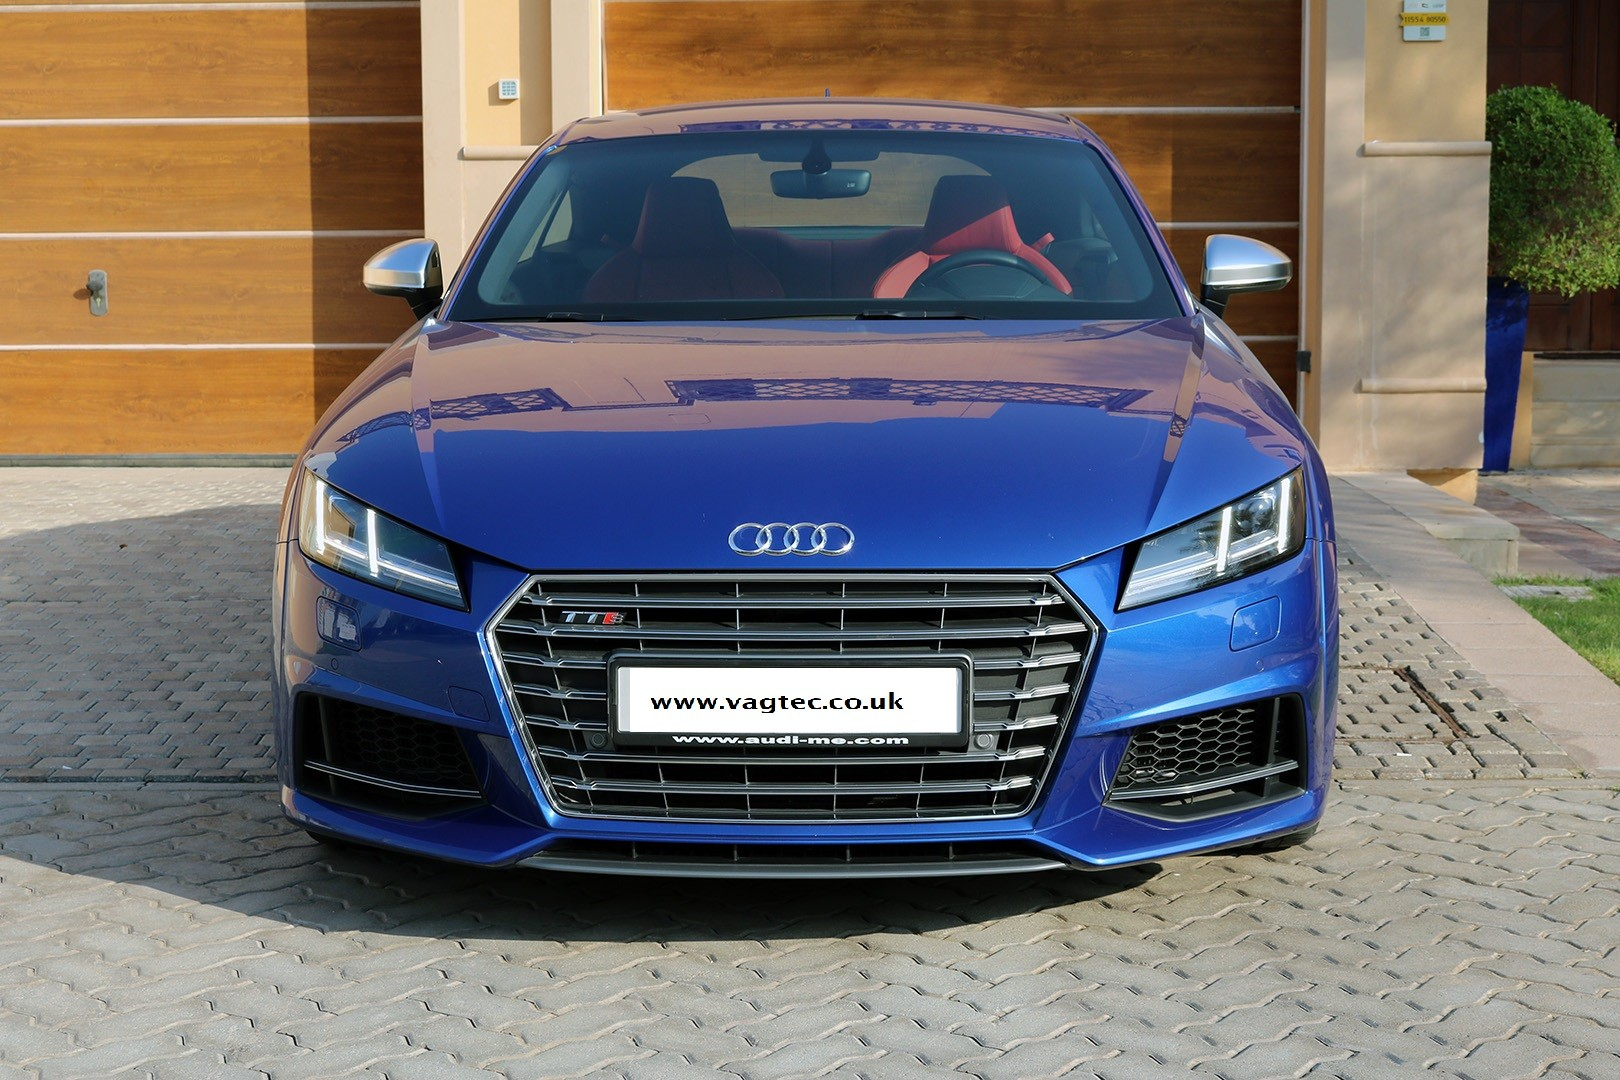 Genuine Audi OEM Retrofit Kit - OPS Optical Parking Sensors - Front